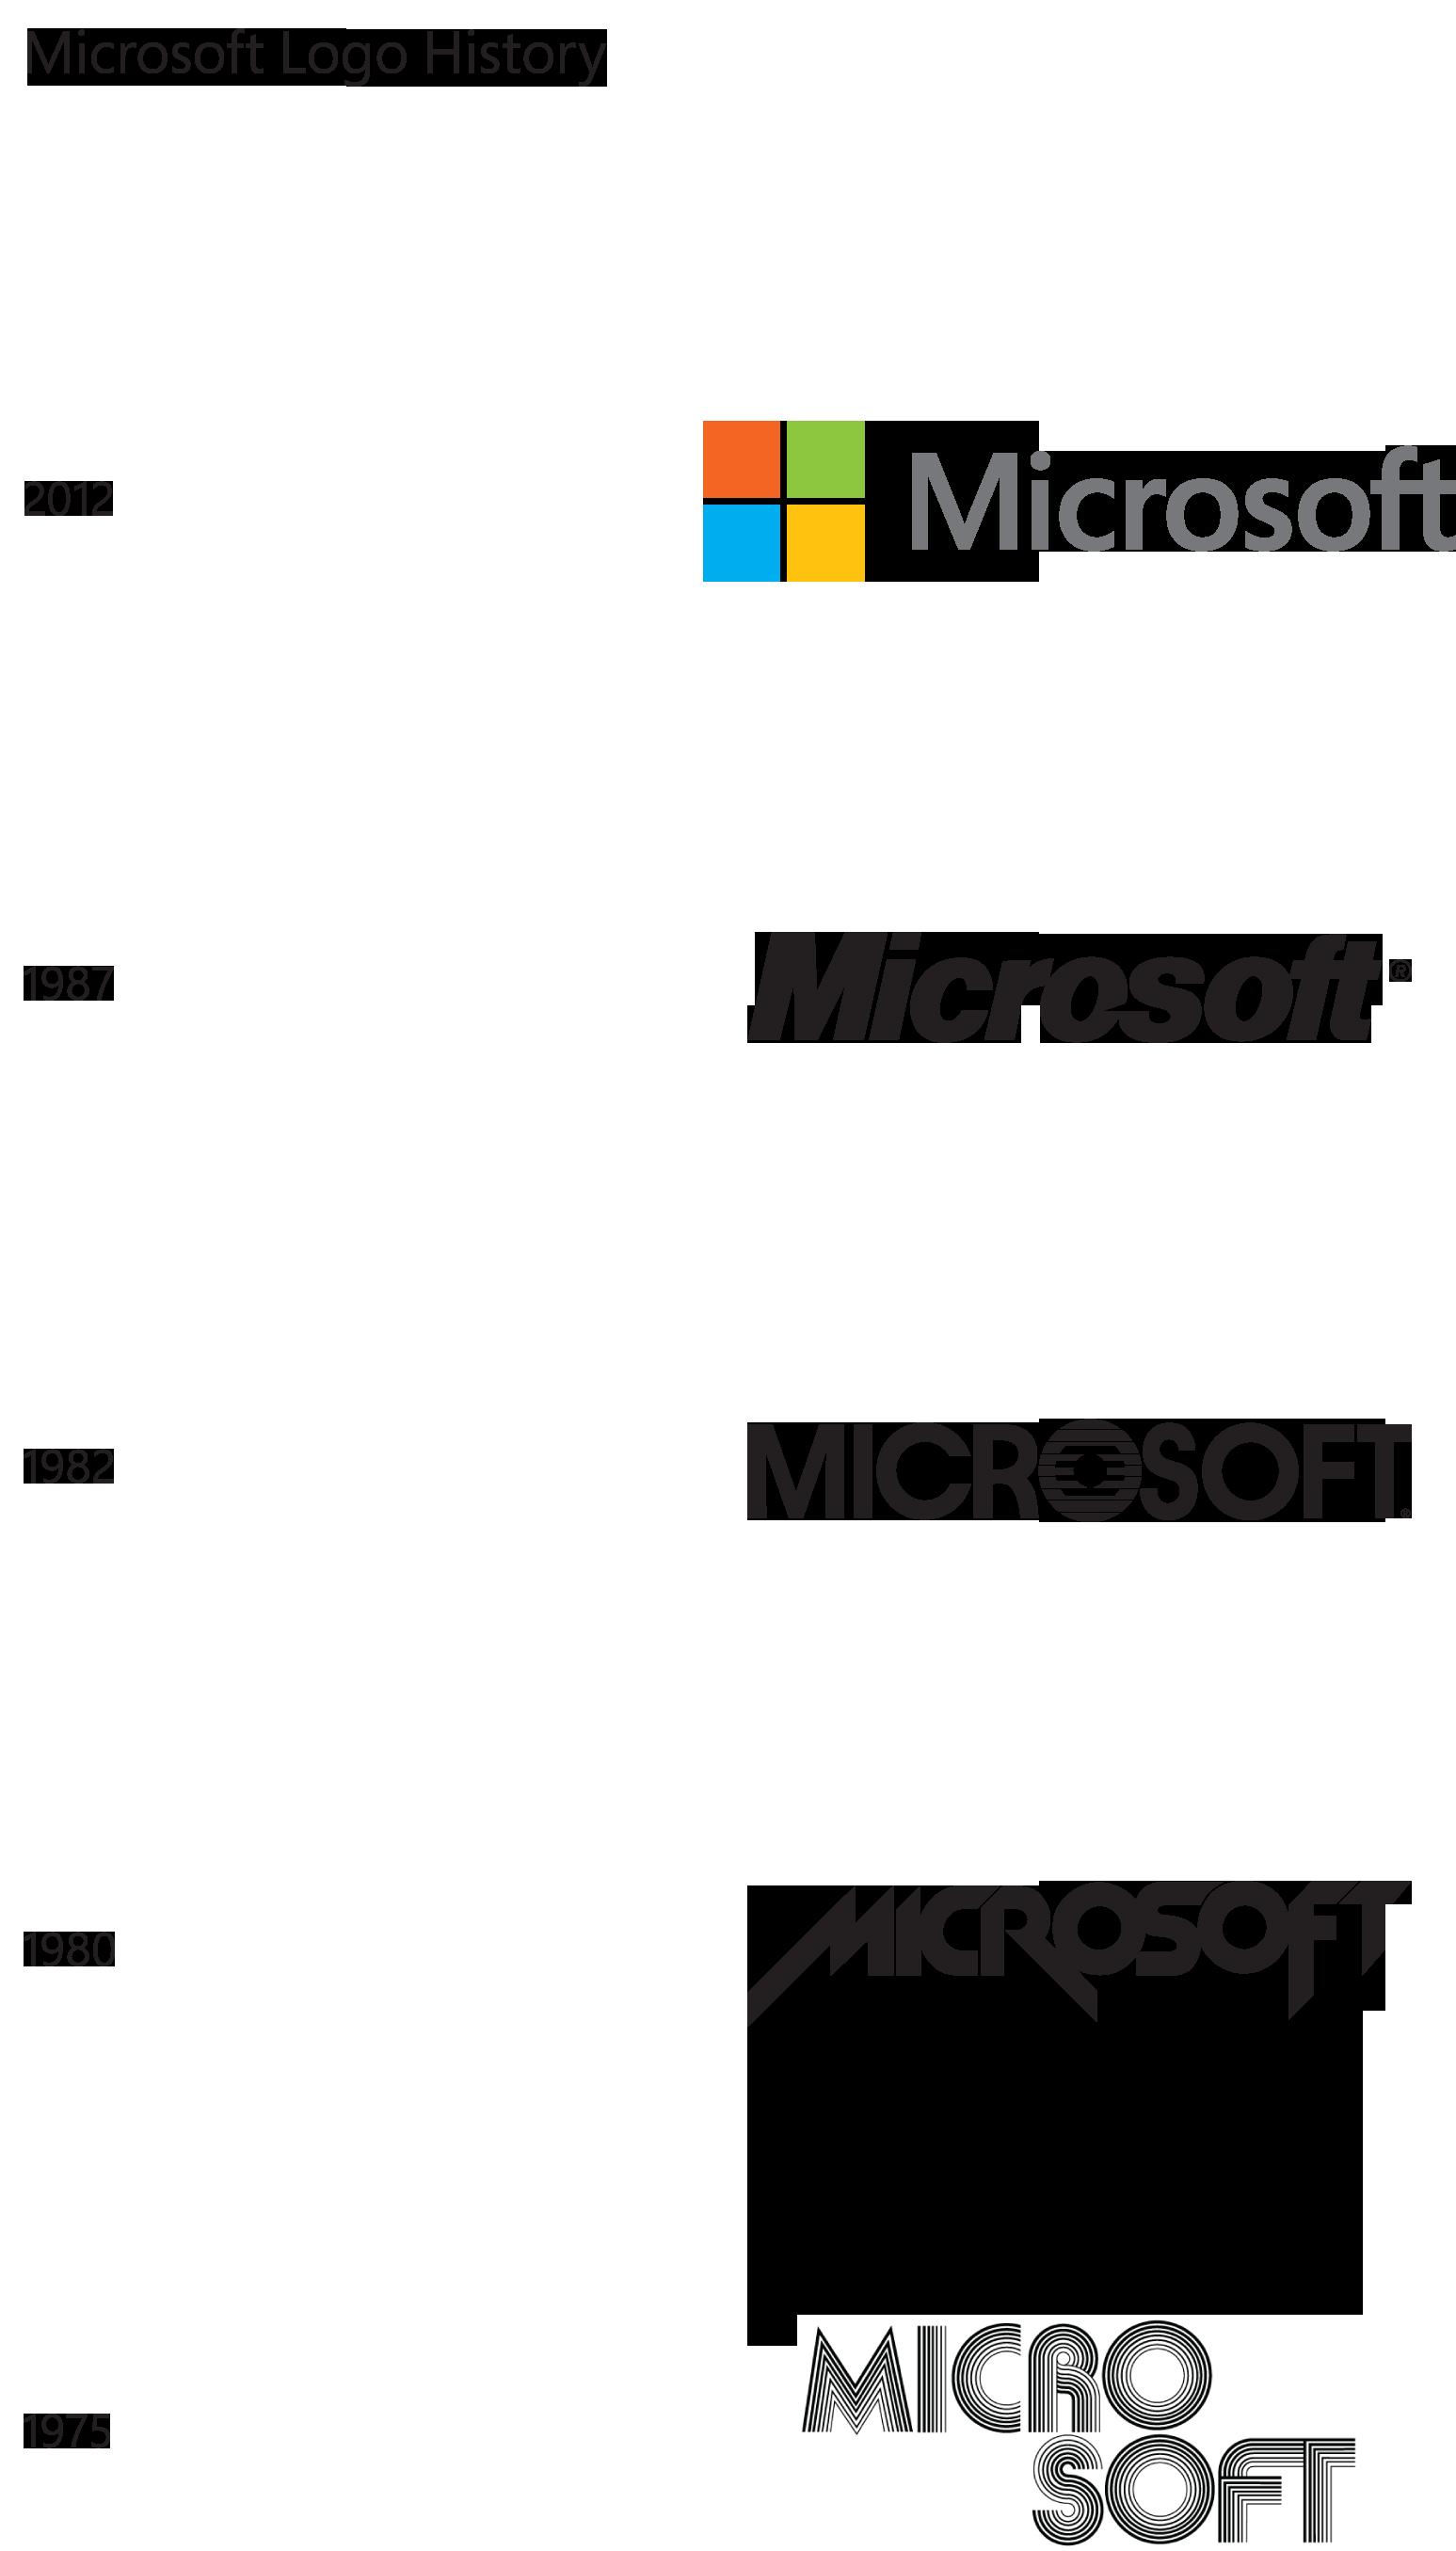 logos history: